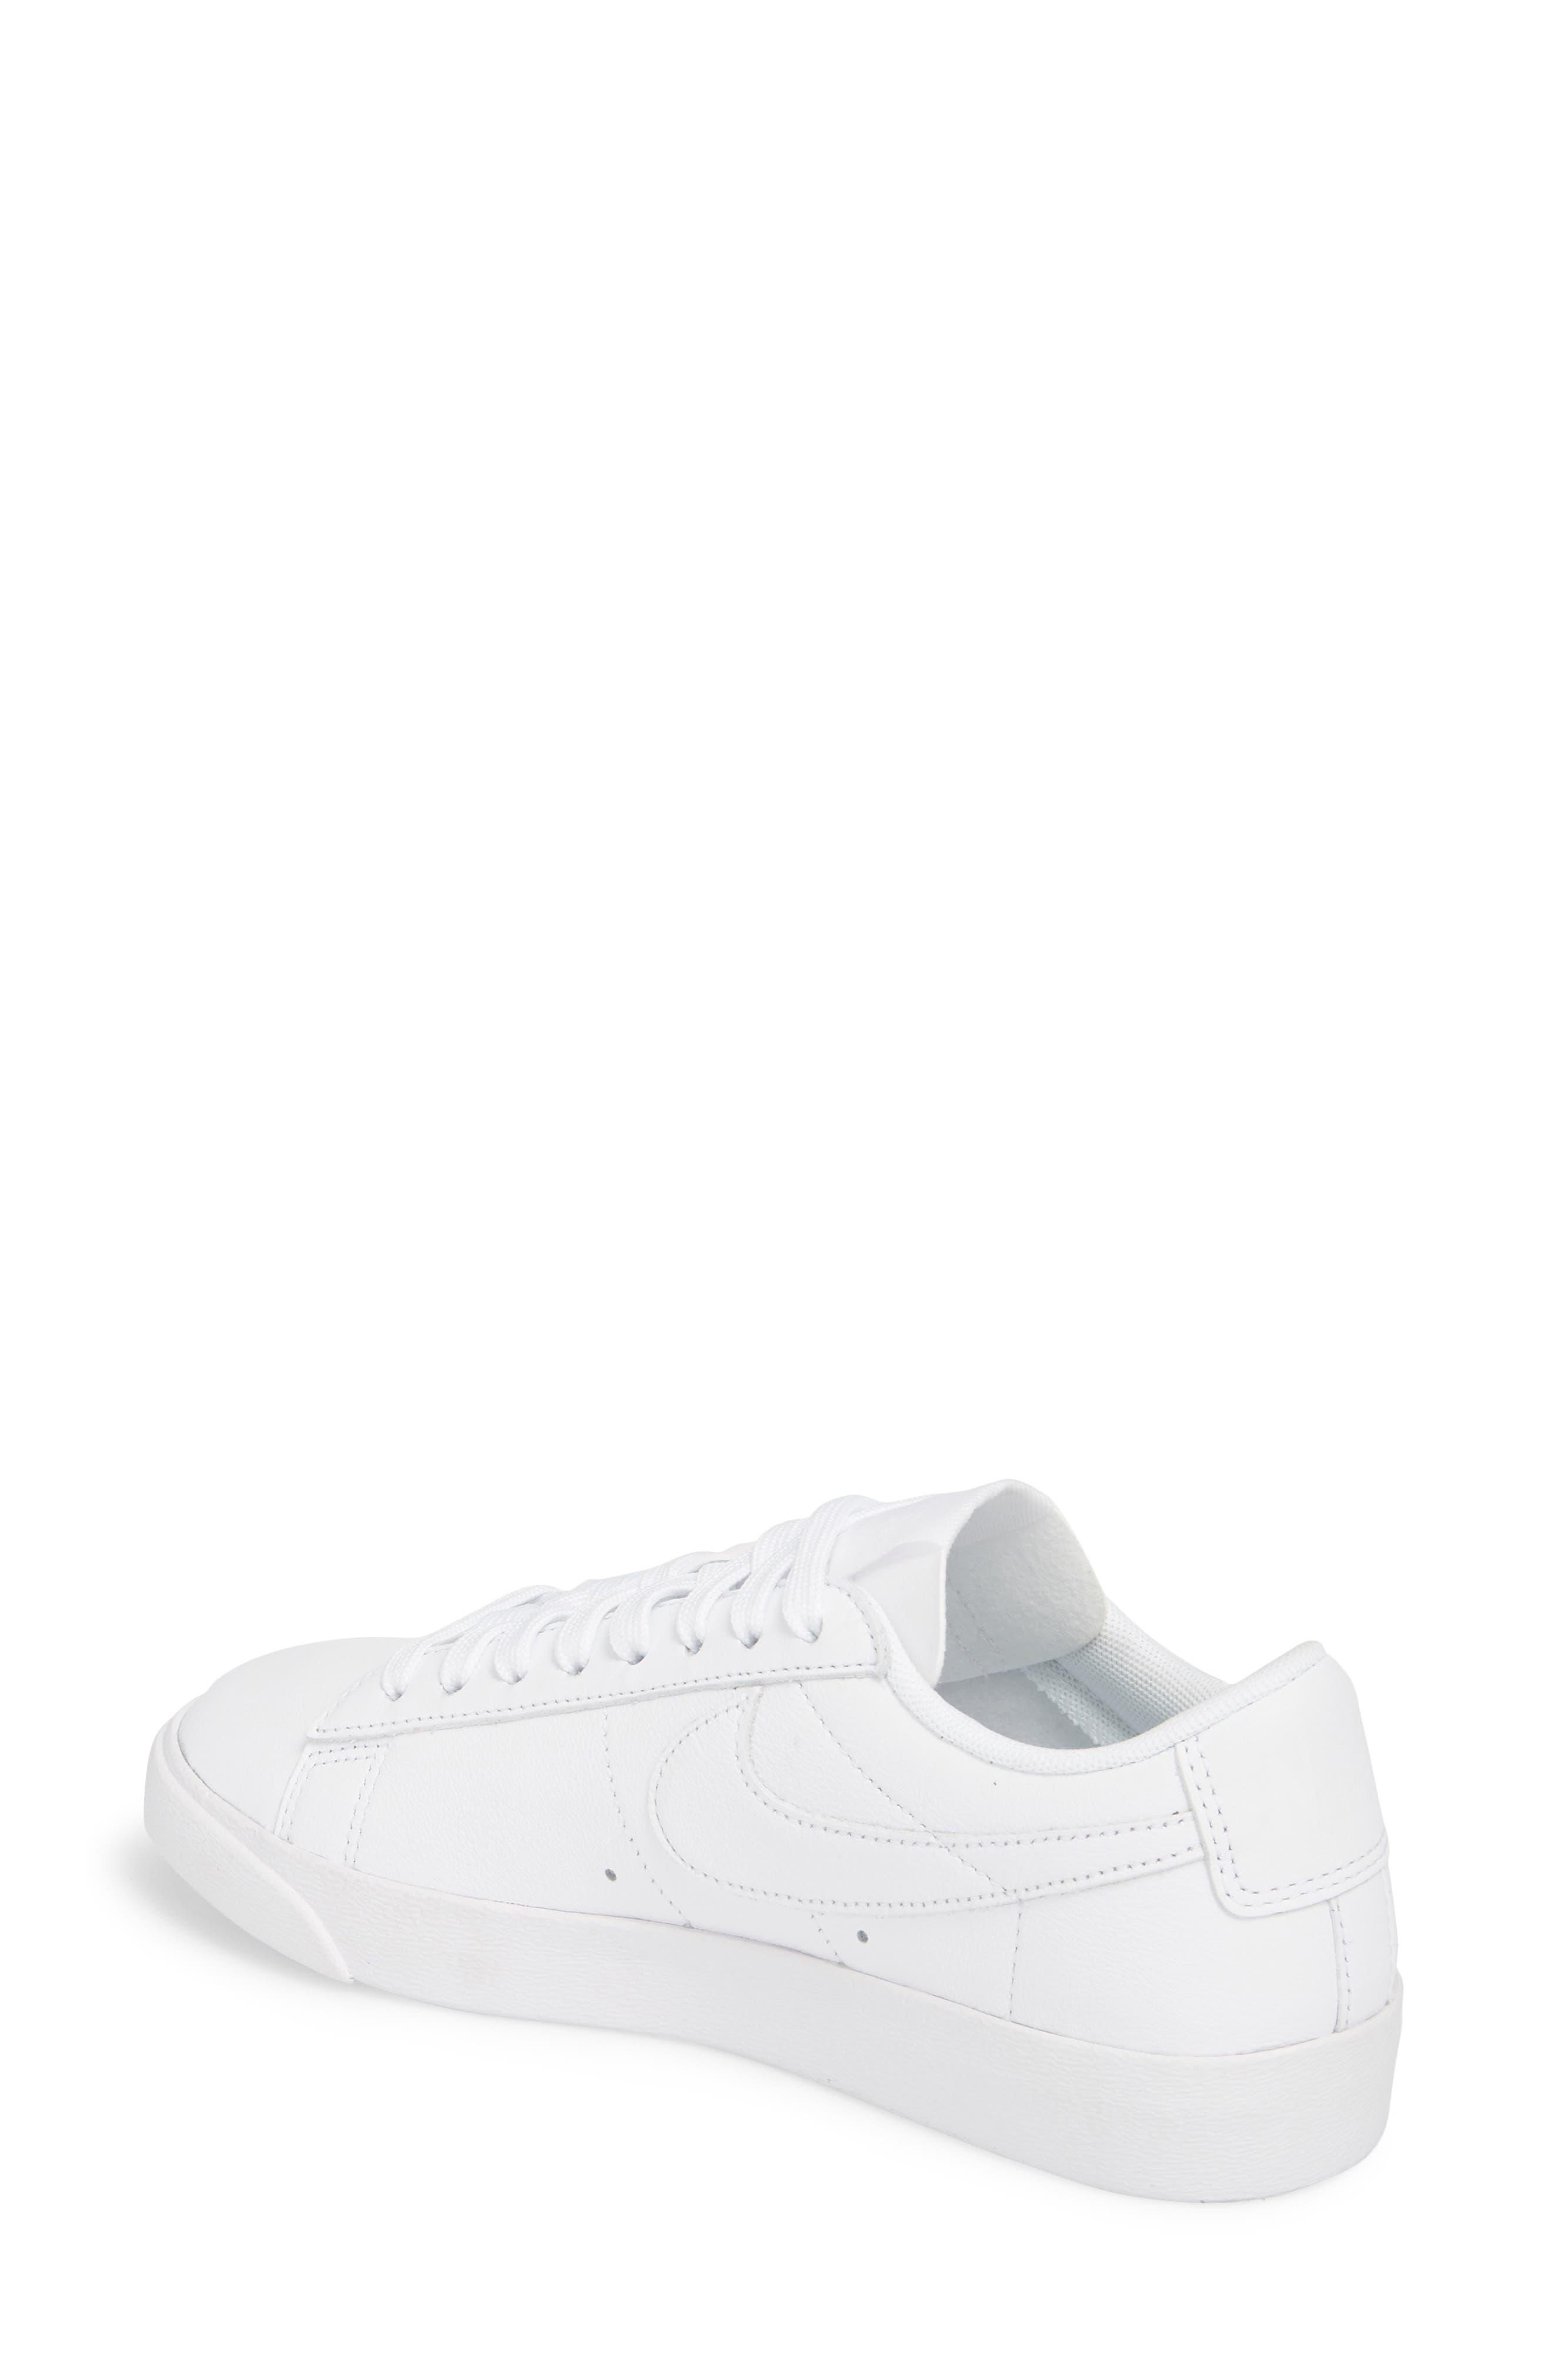 Blazer Low LE Sneaker,                             Alternate thumbnail 2, color,                             104